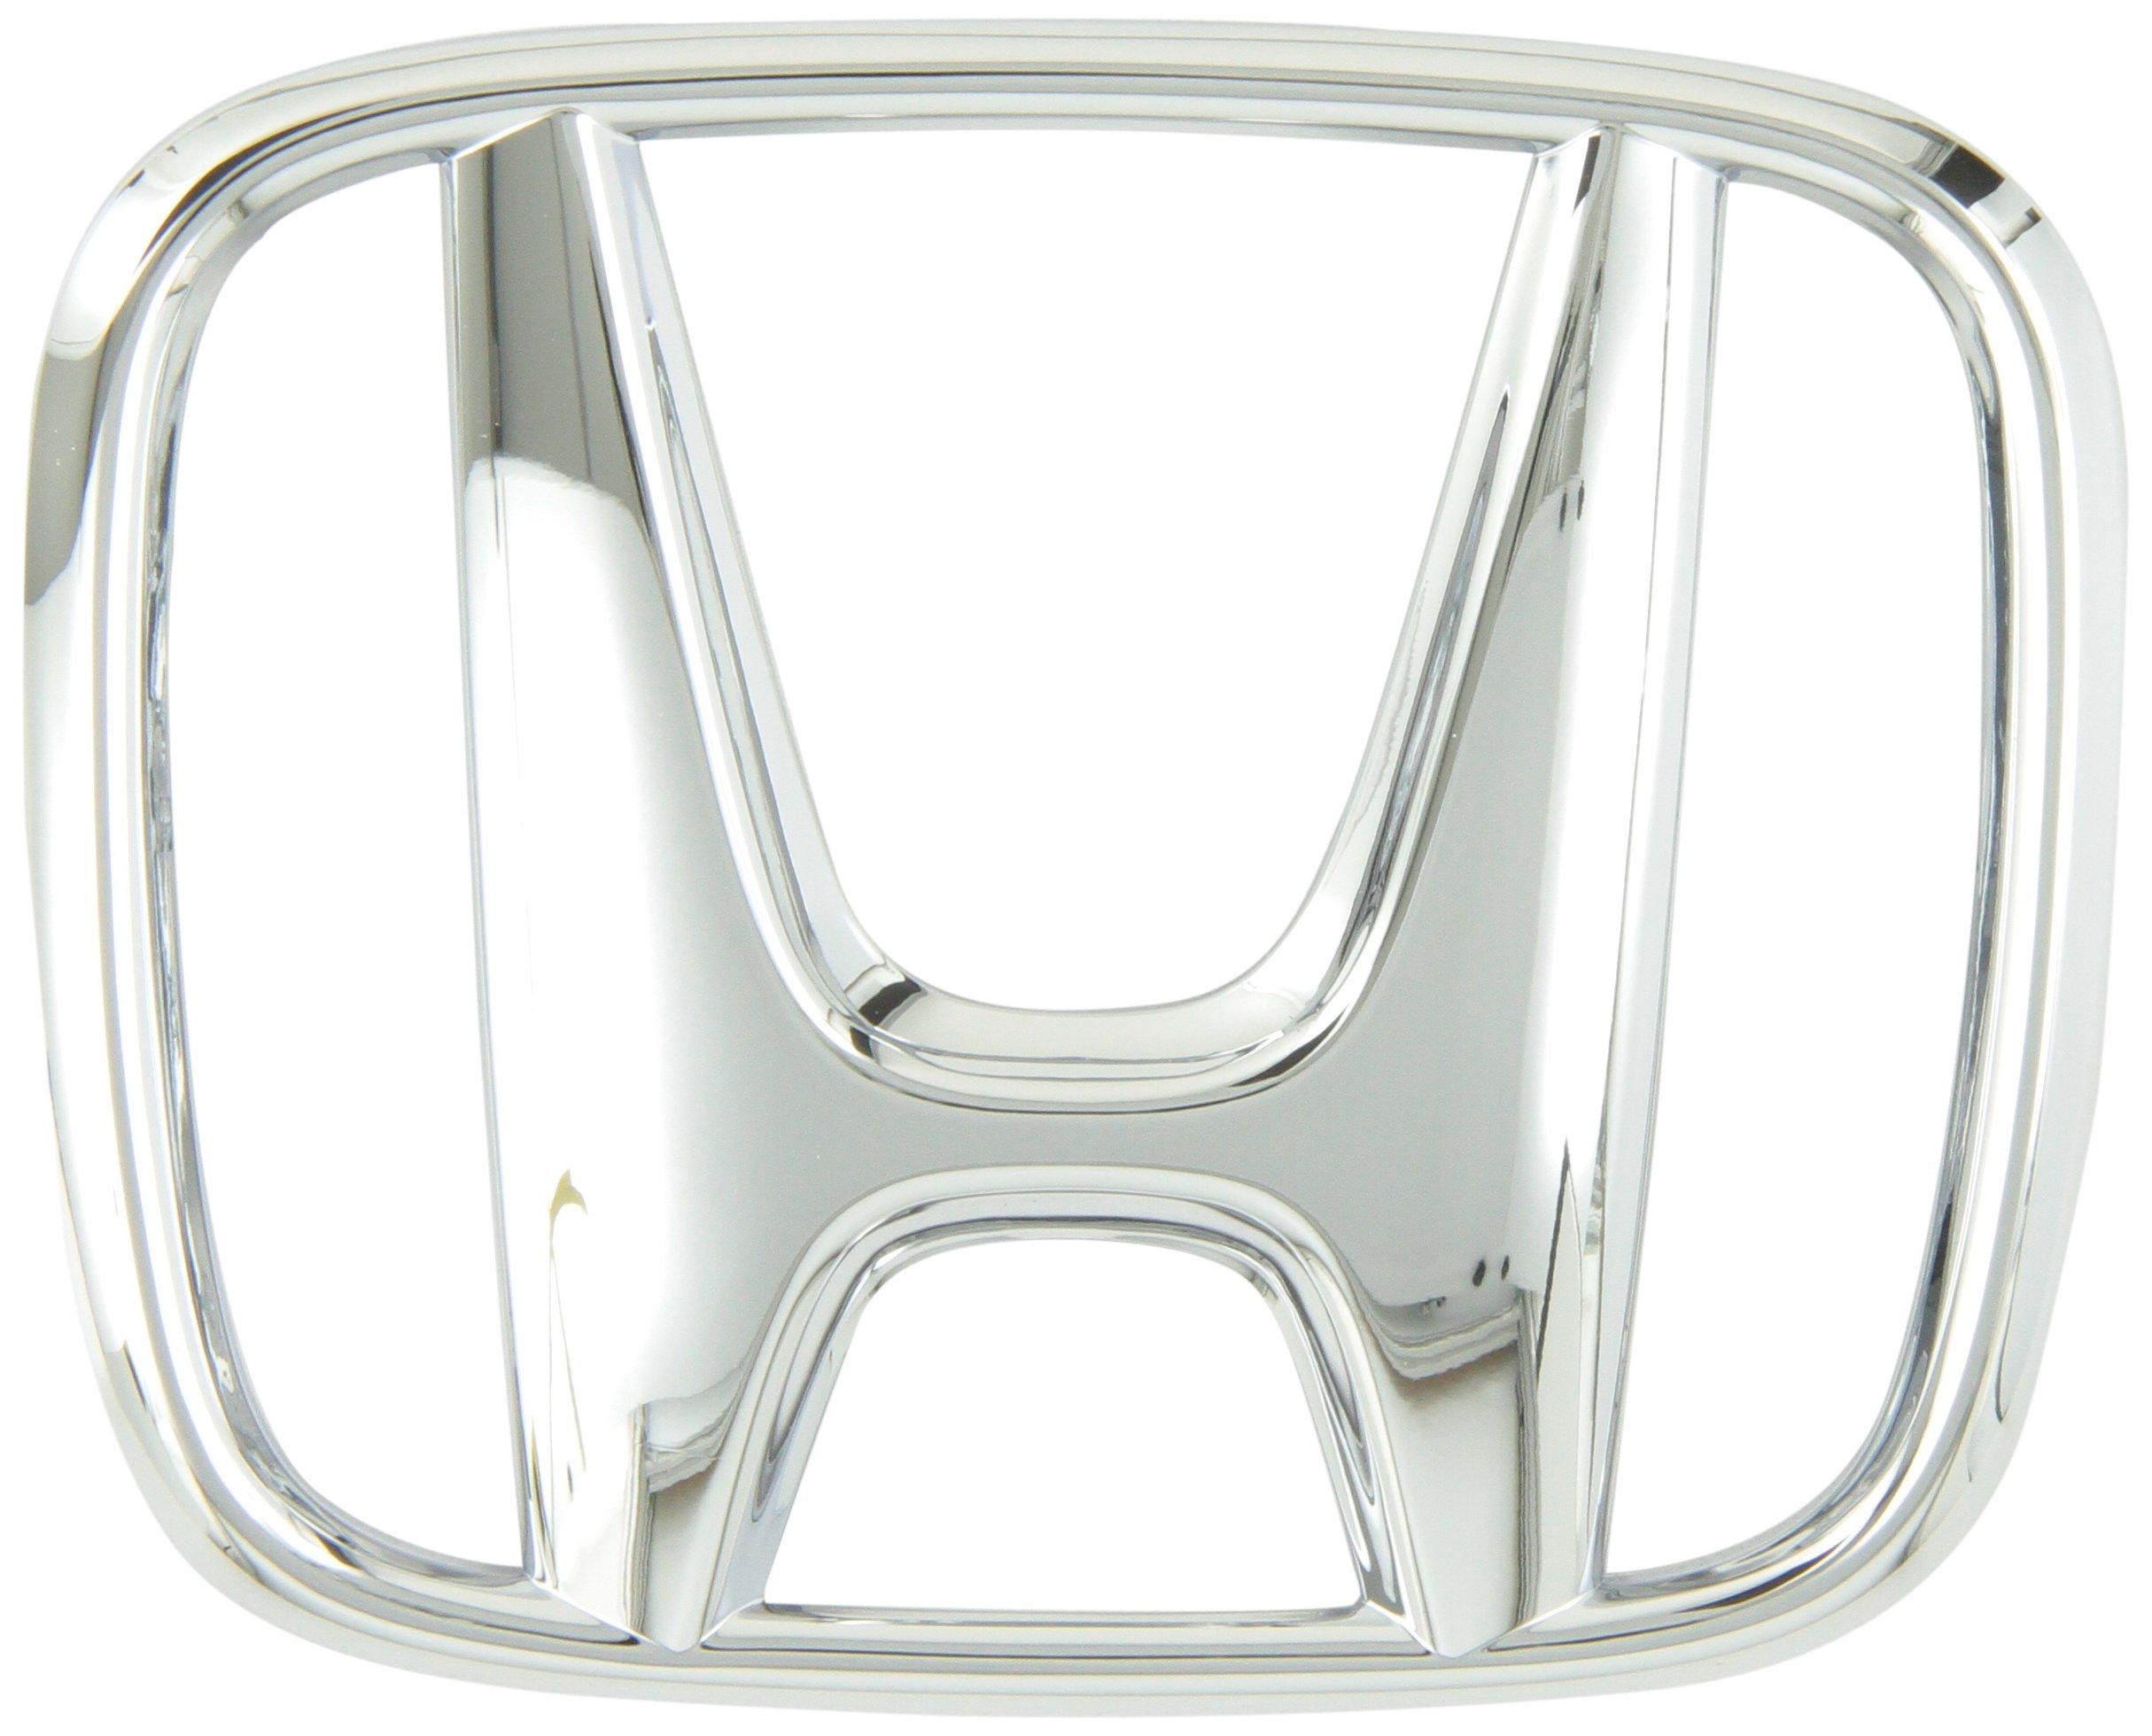 Honda 75700 S9a G00 Front Grille Emblem Accord Sedan Cr 1999 Civic Horn Location V Automotive